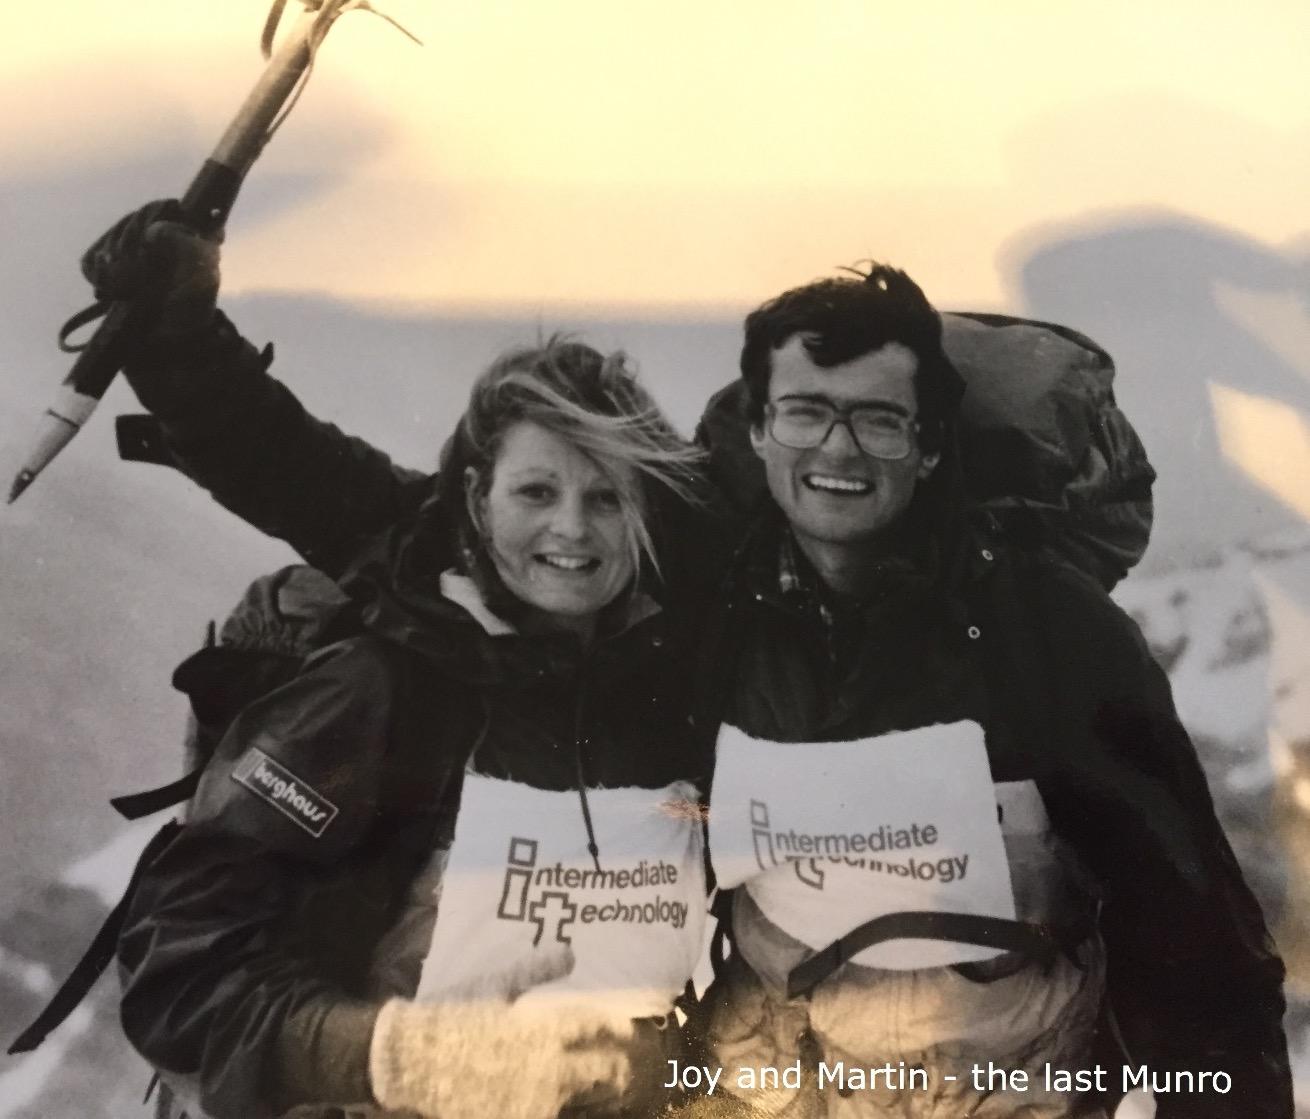 Last Munro 13 Mar 1985